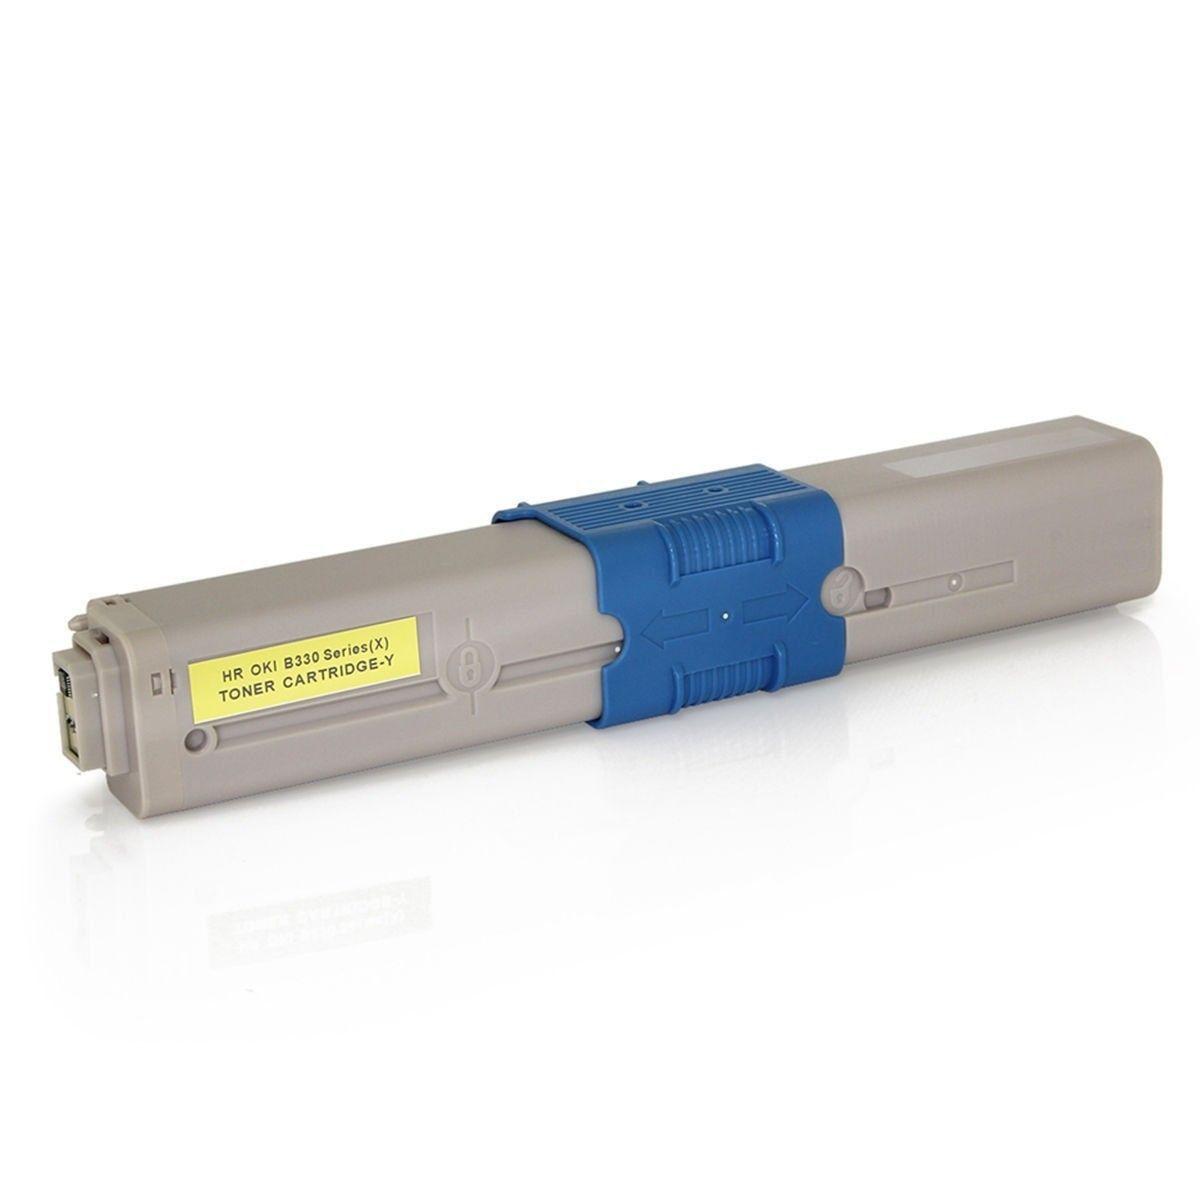 Compatível: Toner C330 C530 para Okidata C331 MC362 CE310dn MC562 C310dn C531dn MC362w MC561 C530dn / Amarelo / 3.000